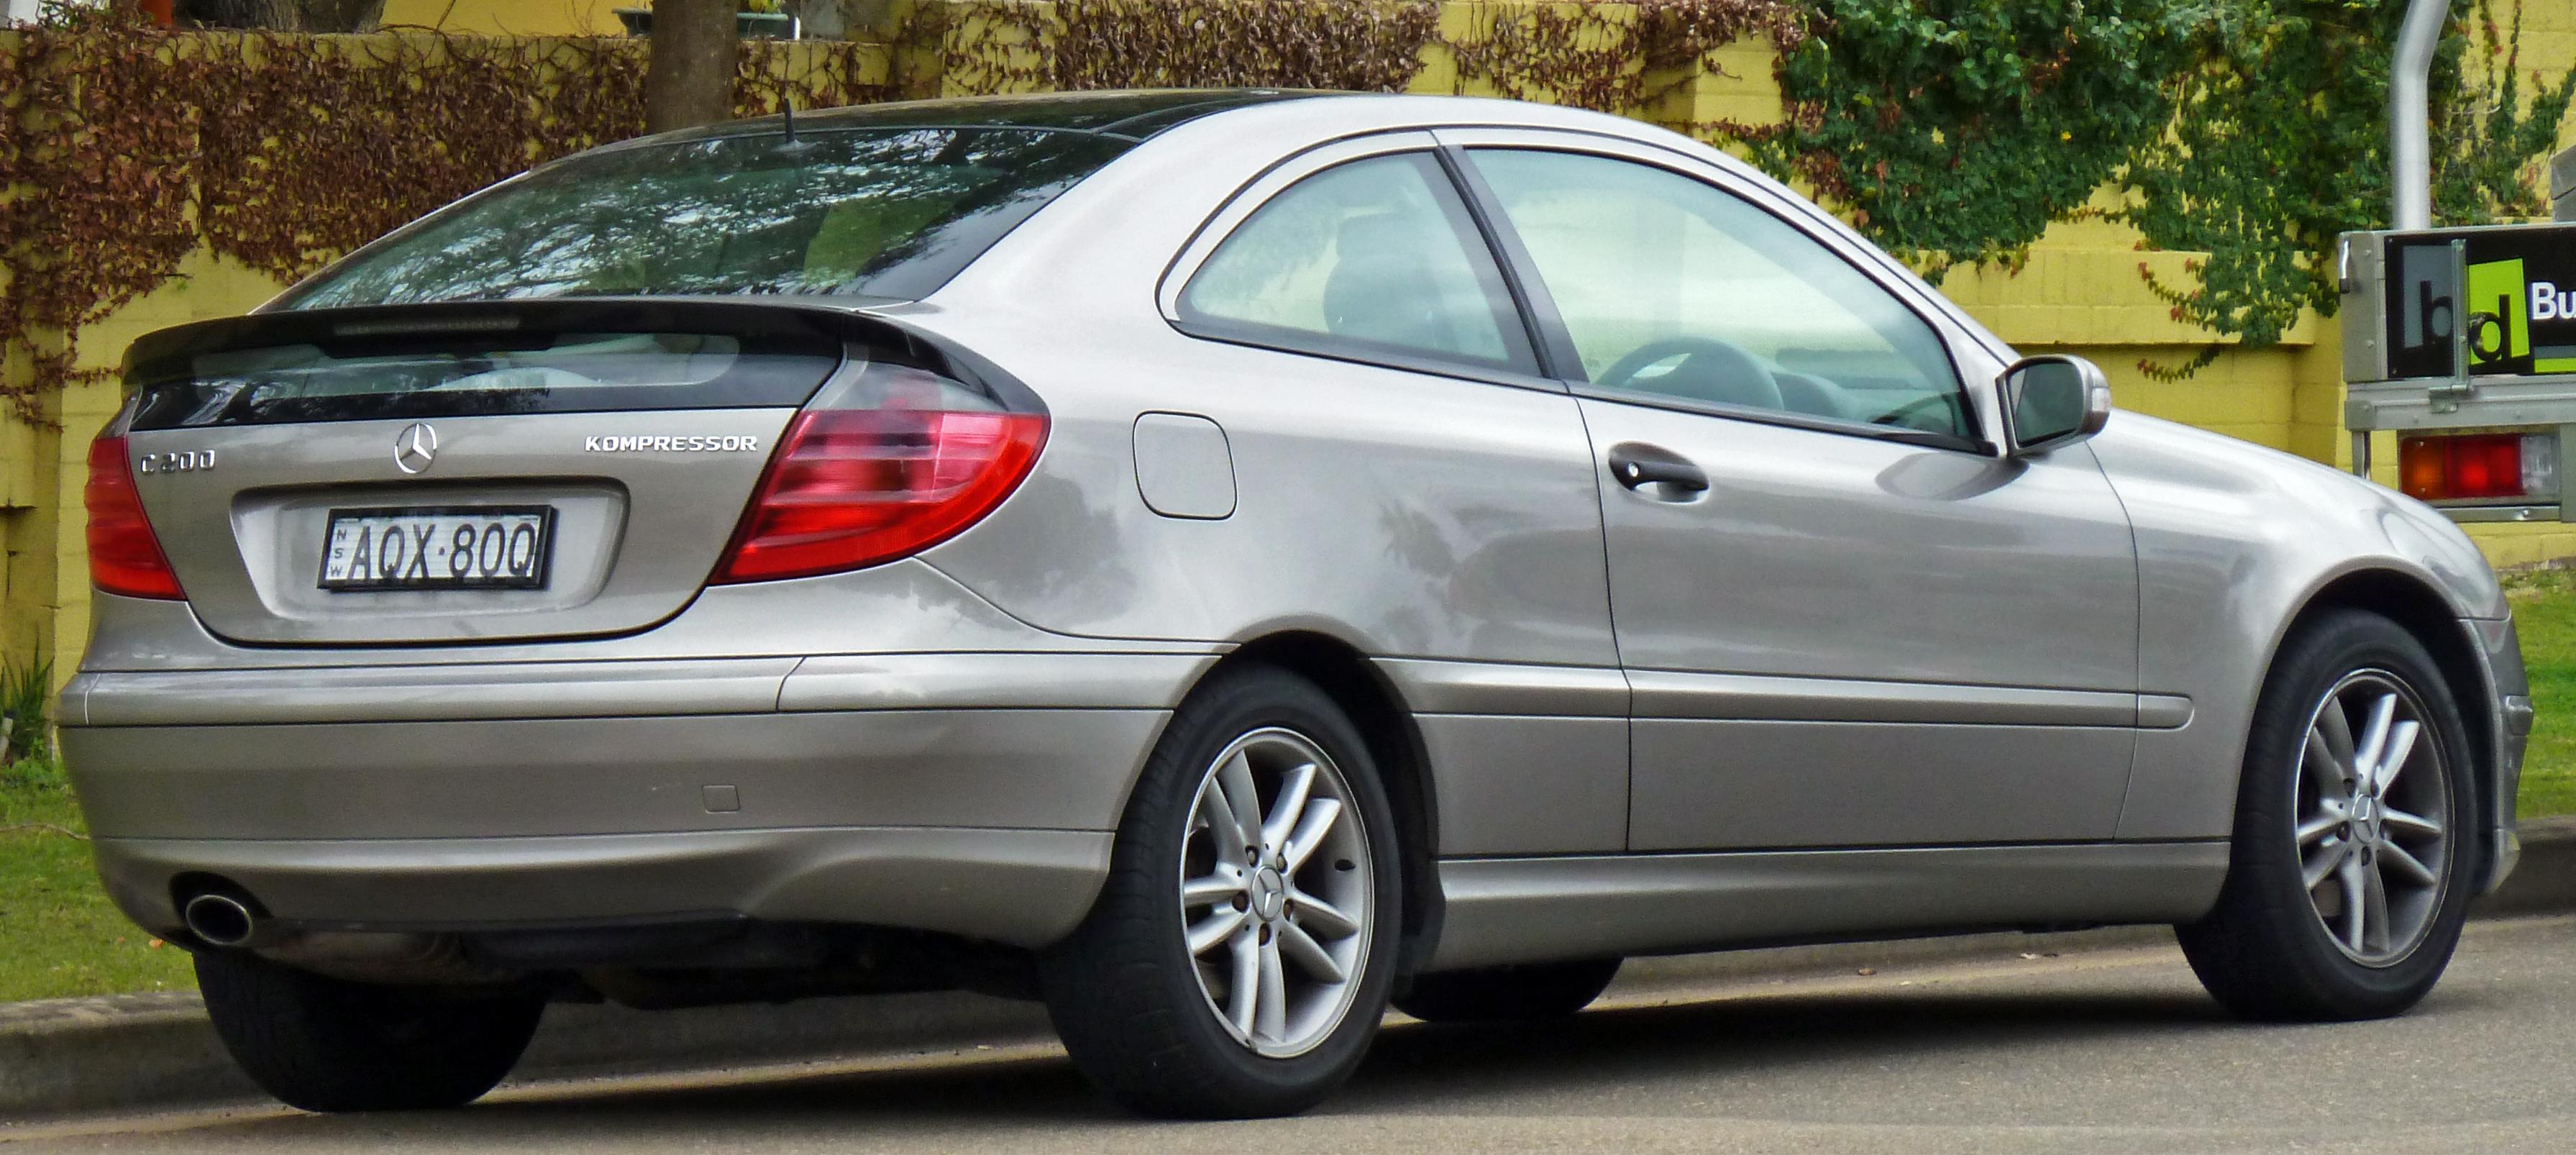 Mercedes C Coupe Kompressor Rear Door